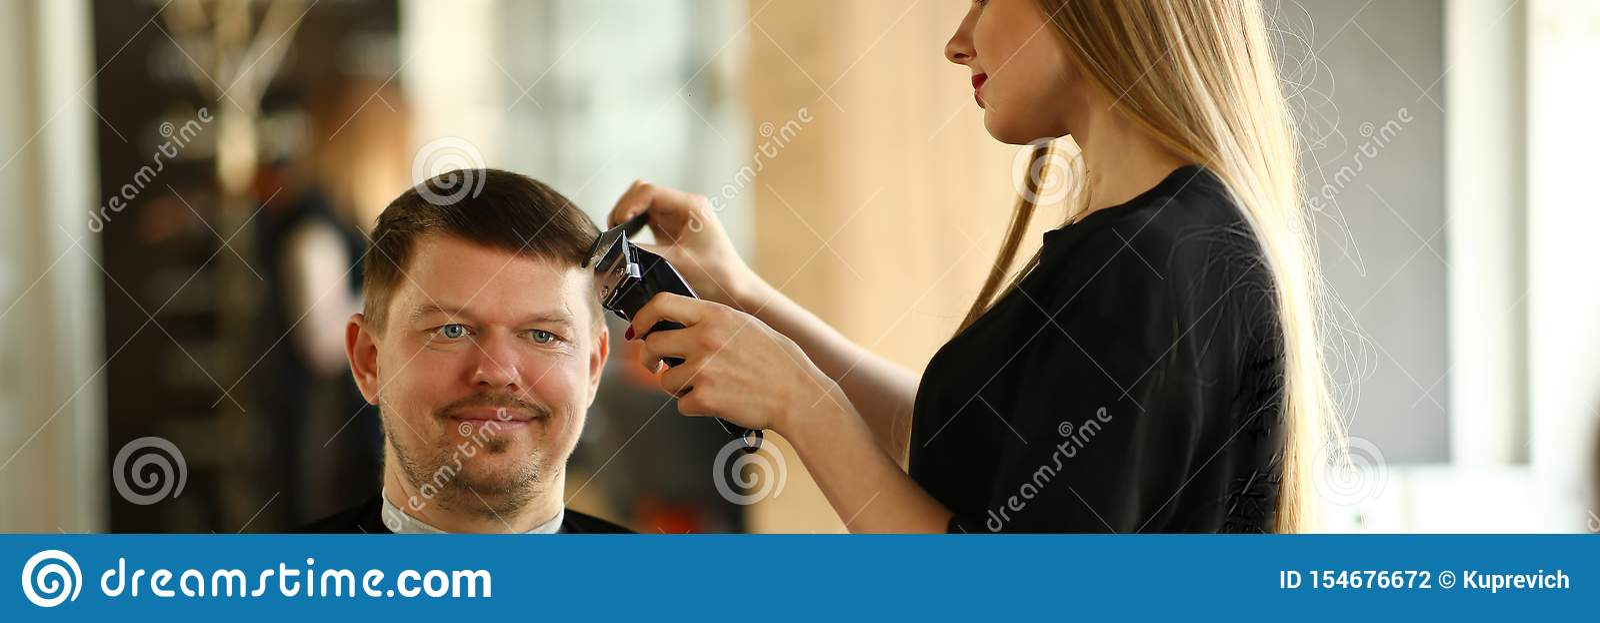 Kvinnafris?r Making Razor Haircut f?r man